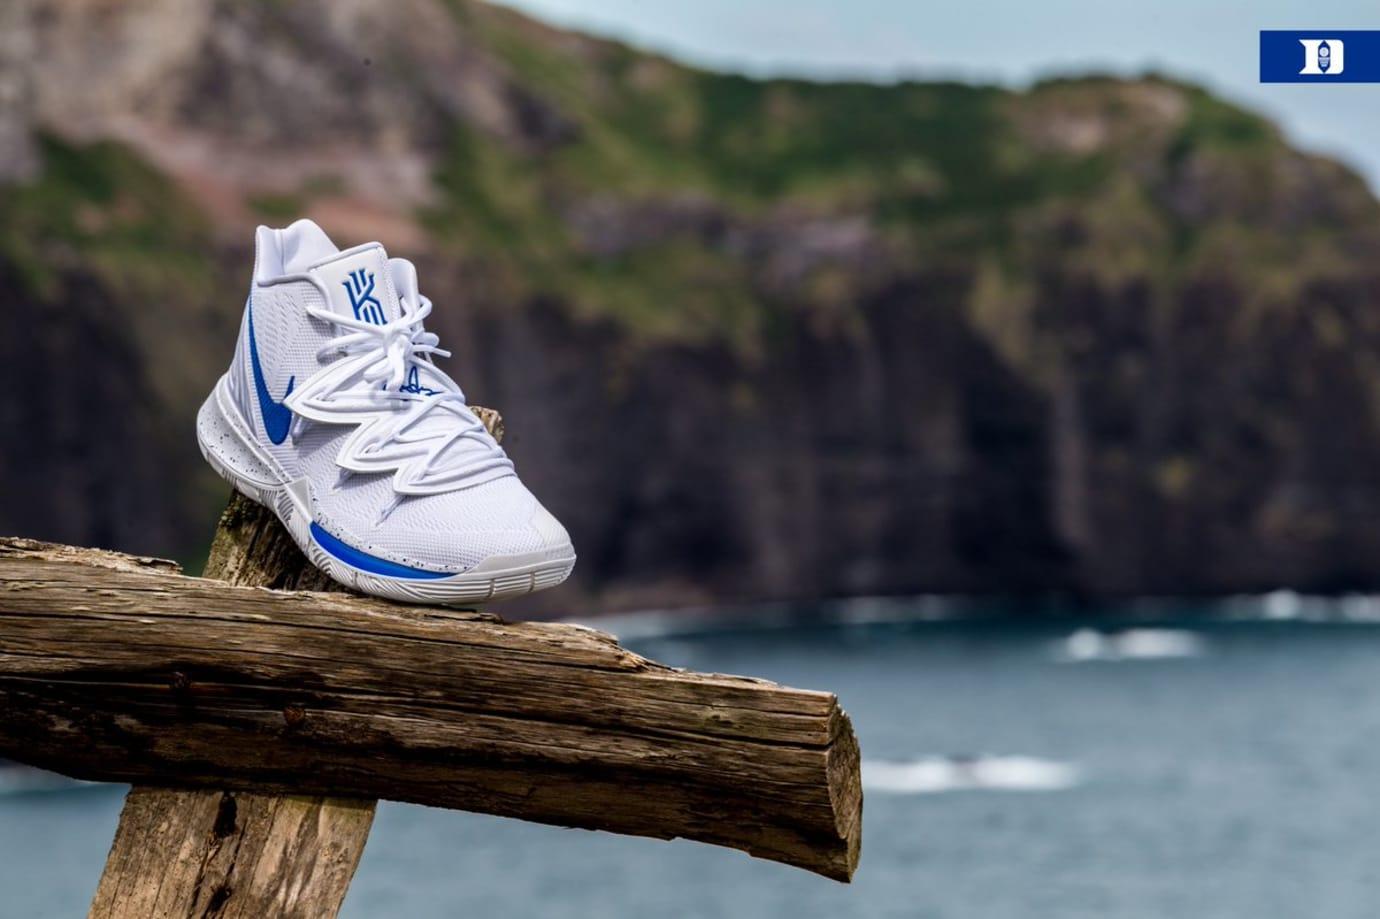 Nike Kyrie 5 'Duke' PE White (Front)